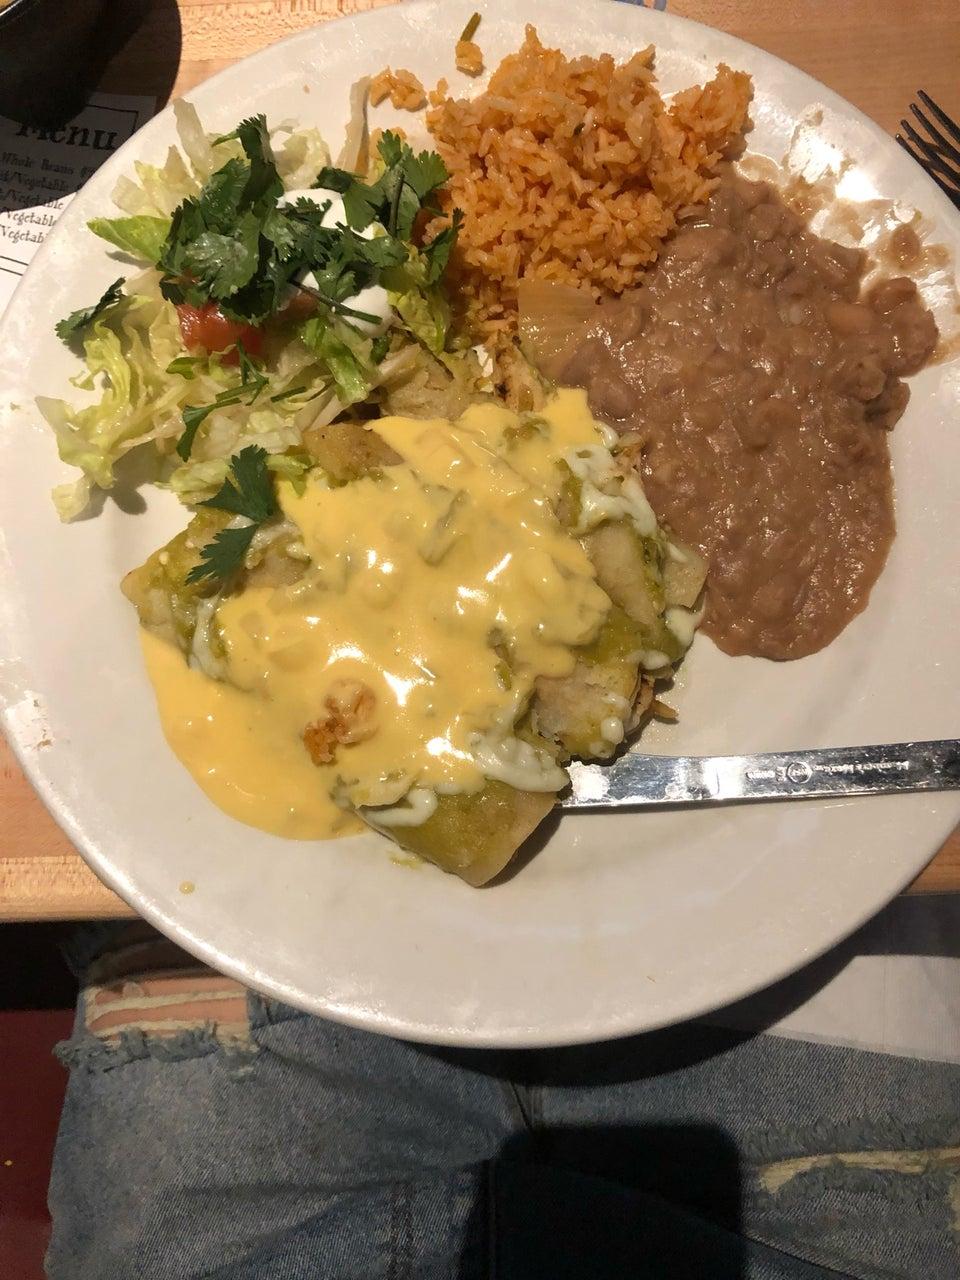 Lucy's Cafe West 6600 N Mesa St #401, El Paso